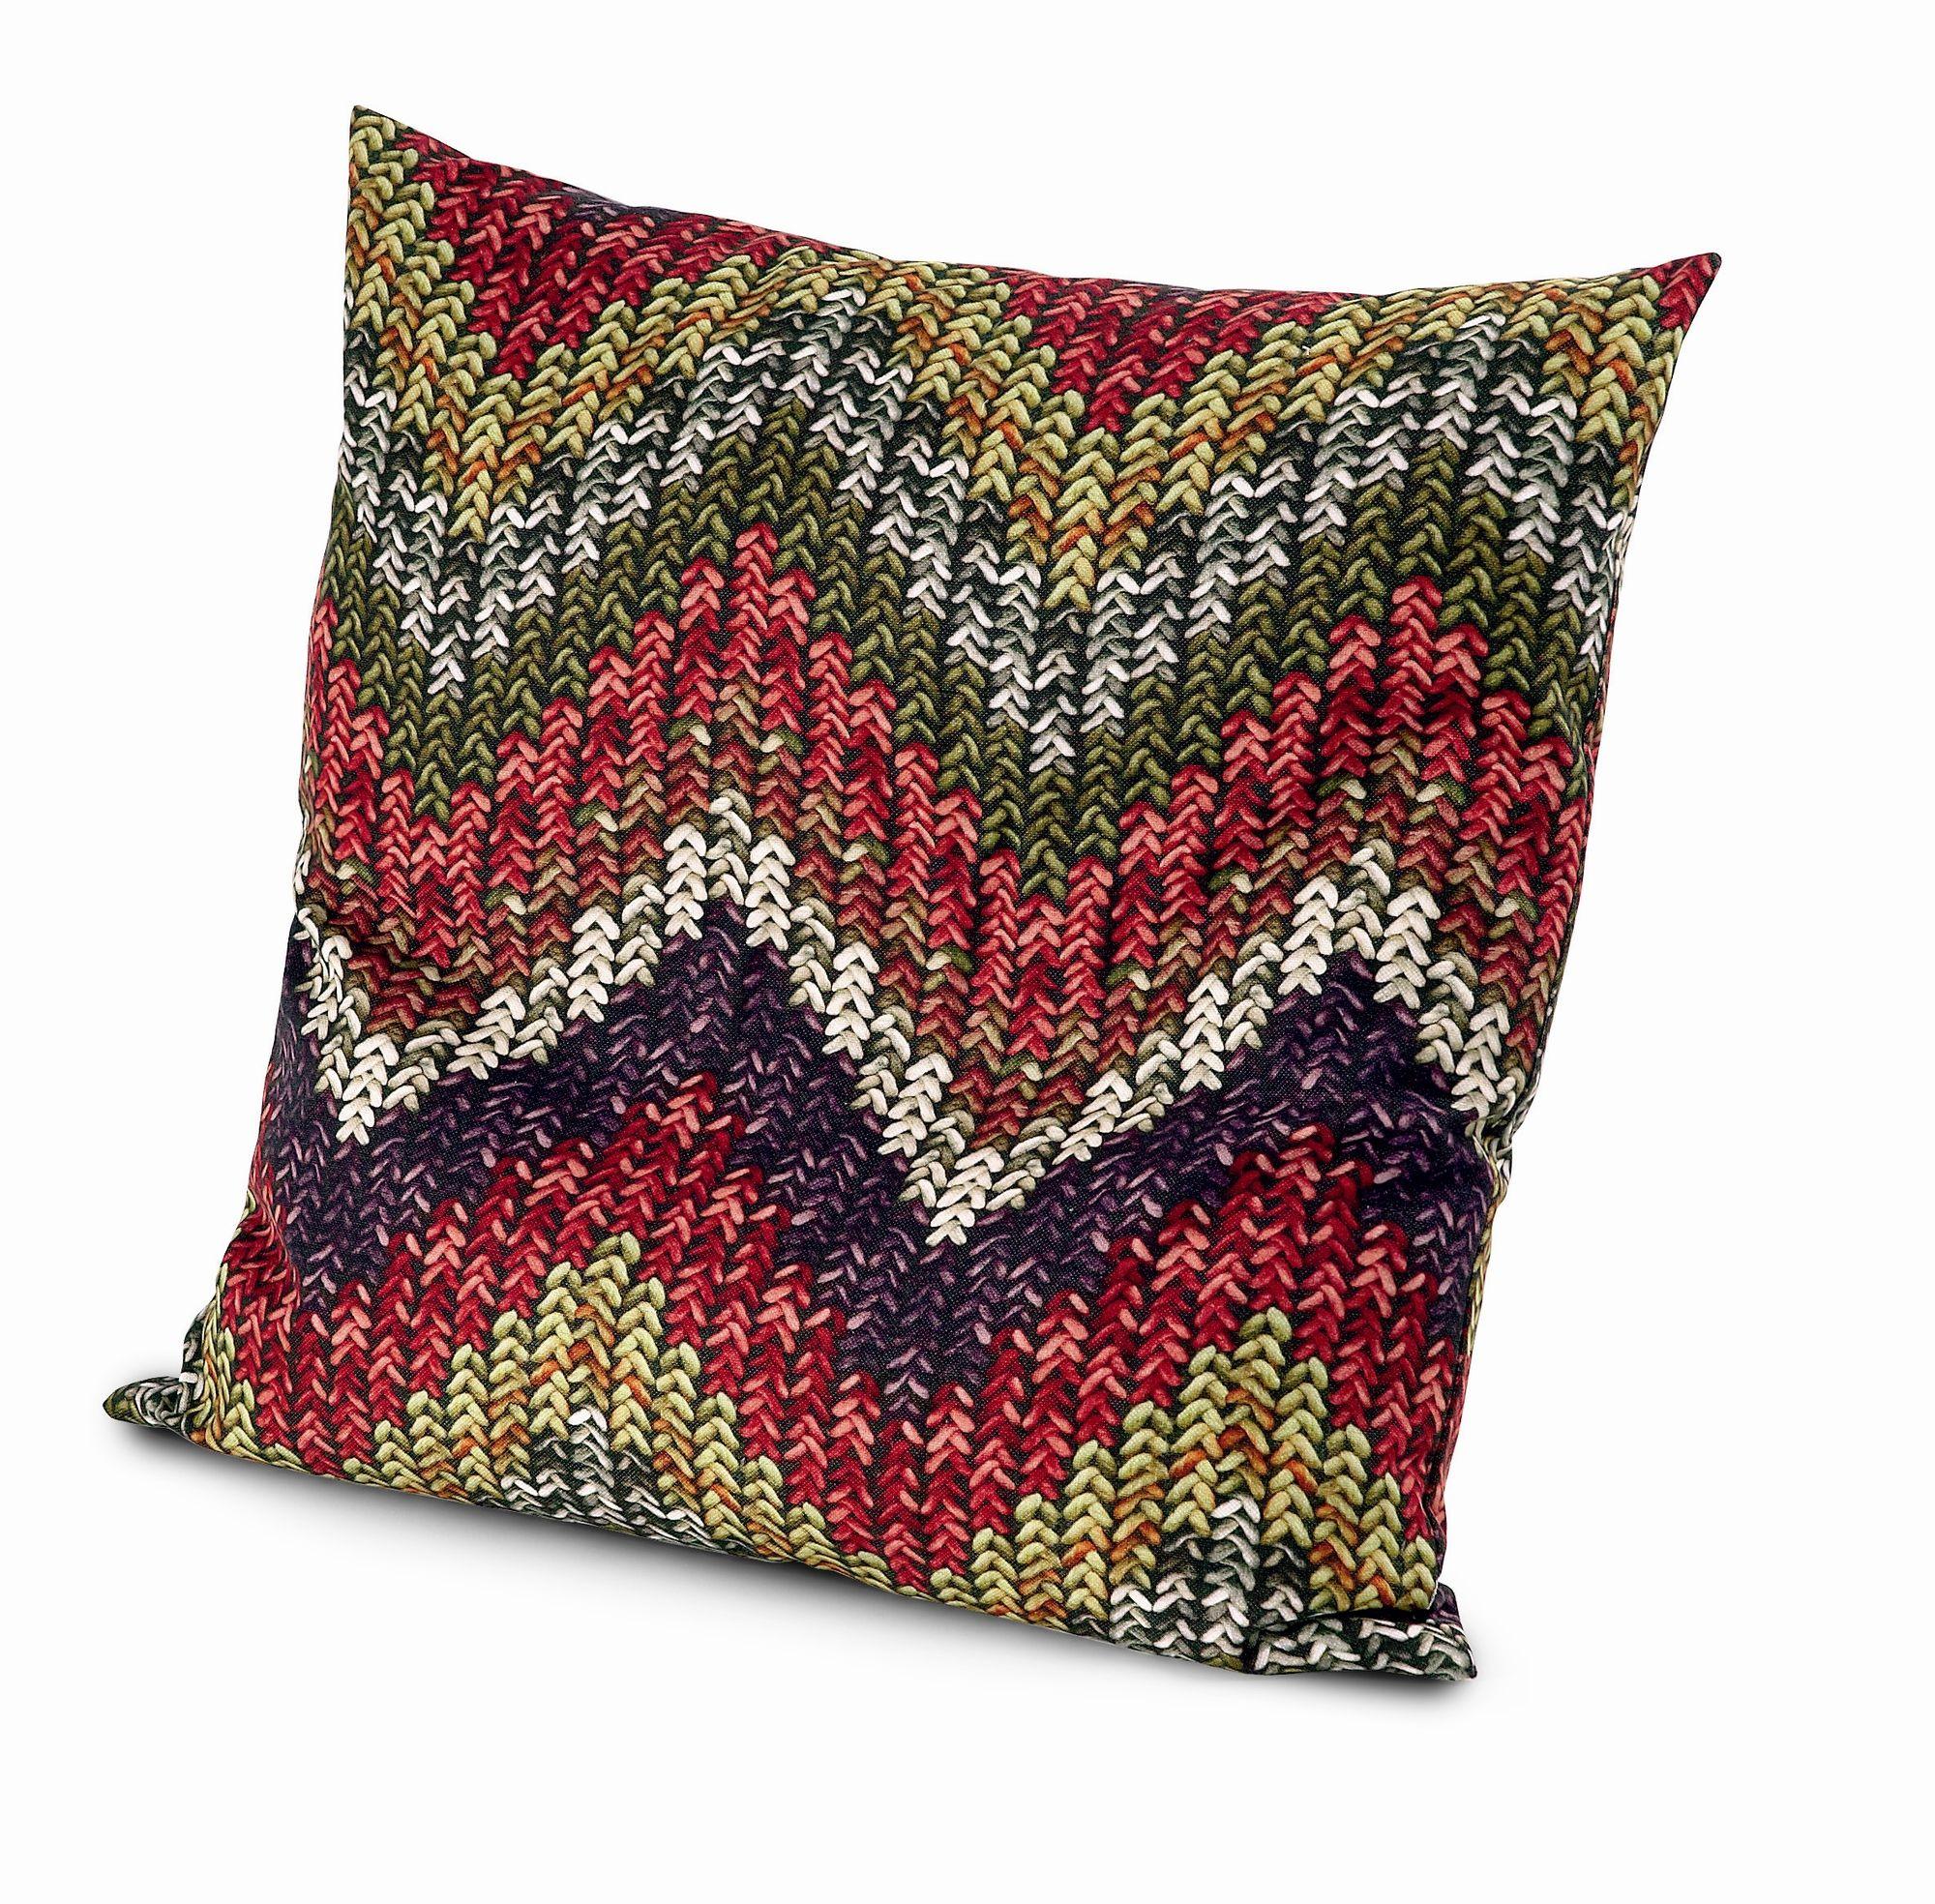 cut zigzag velvet pillow old missoni stripe designer throw two new weavers home design nador fabric world pillows